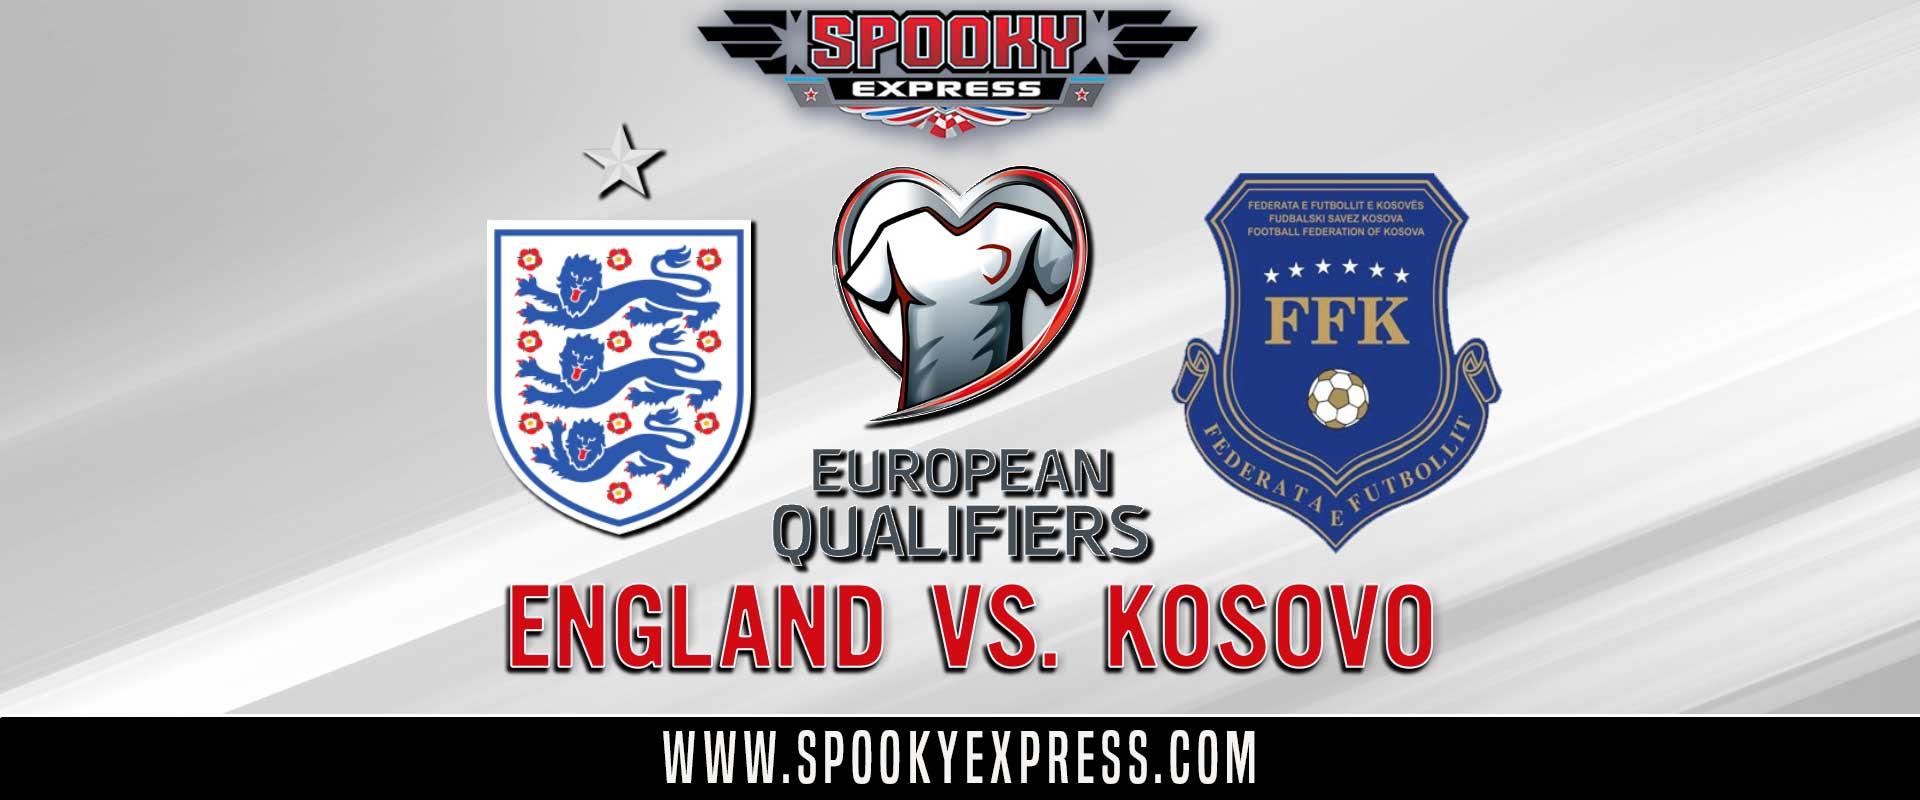 england vs kosovo - photo #2